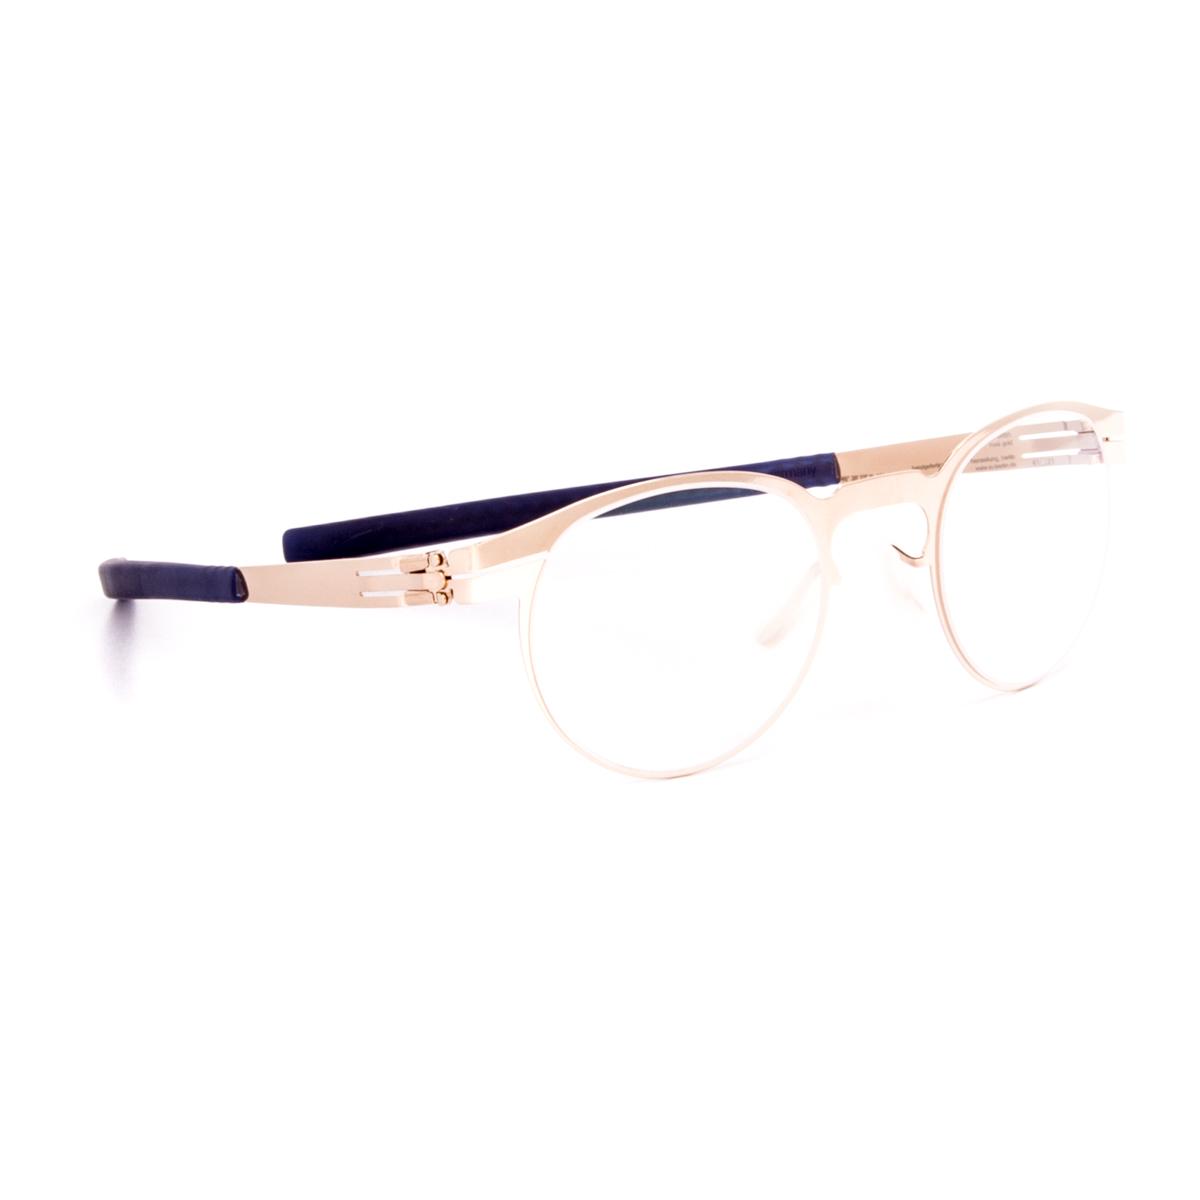 Non Prescription Glasses Gold Frame : ic! Berlin Ofen Eyeglasses Rose Gold Frame / RX Clear Demo ...